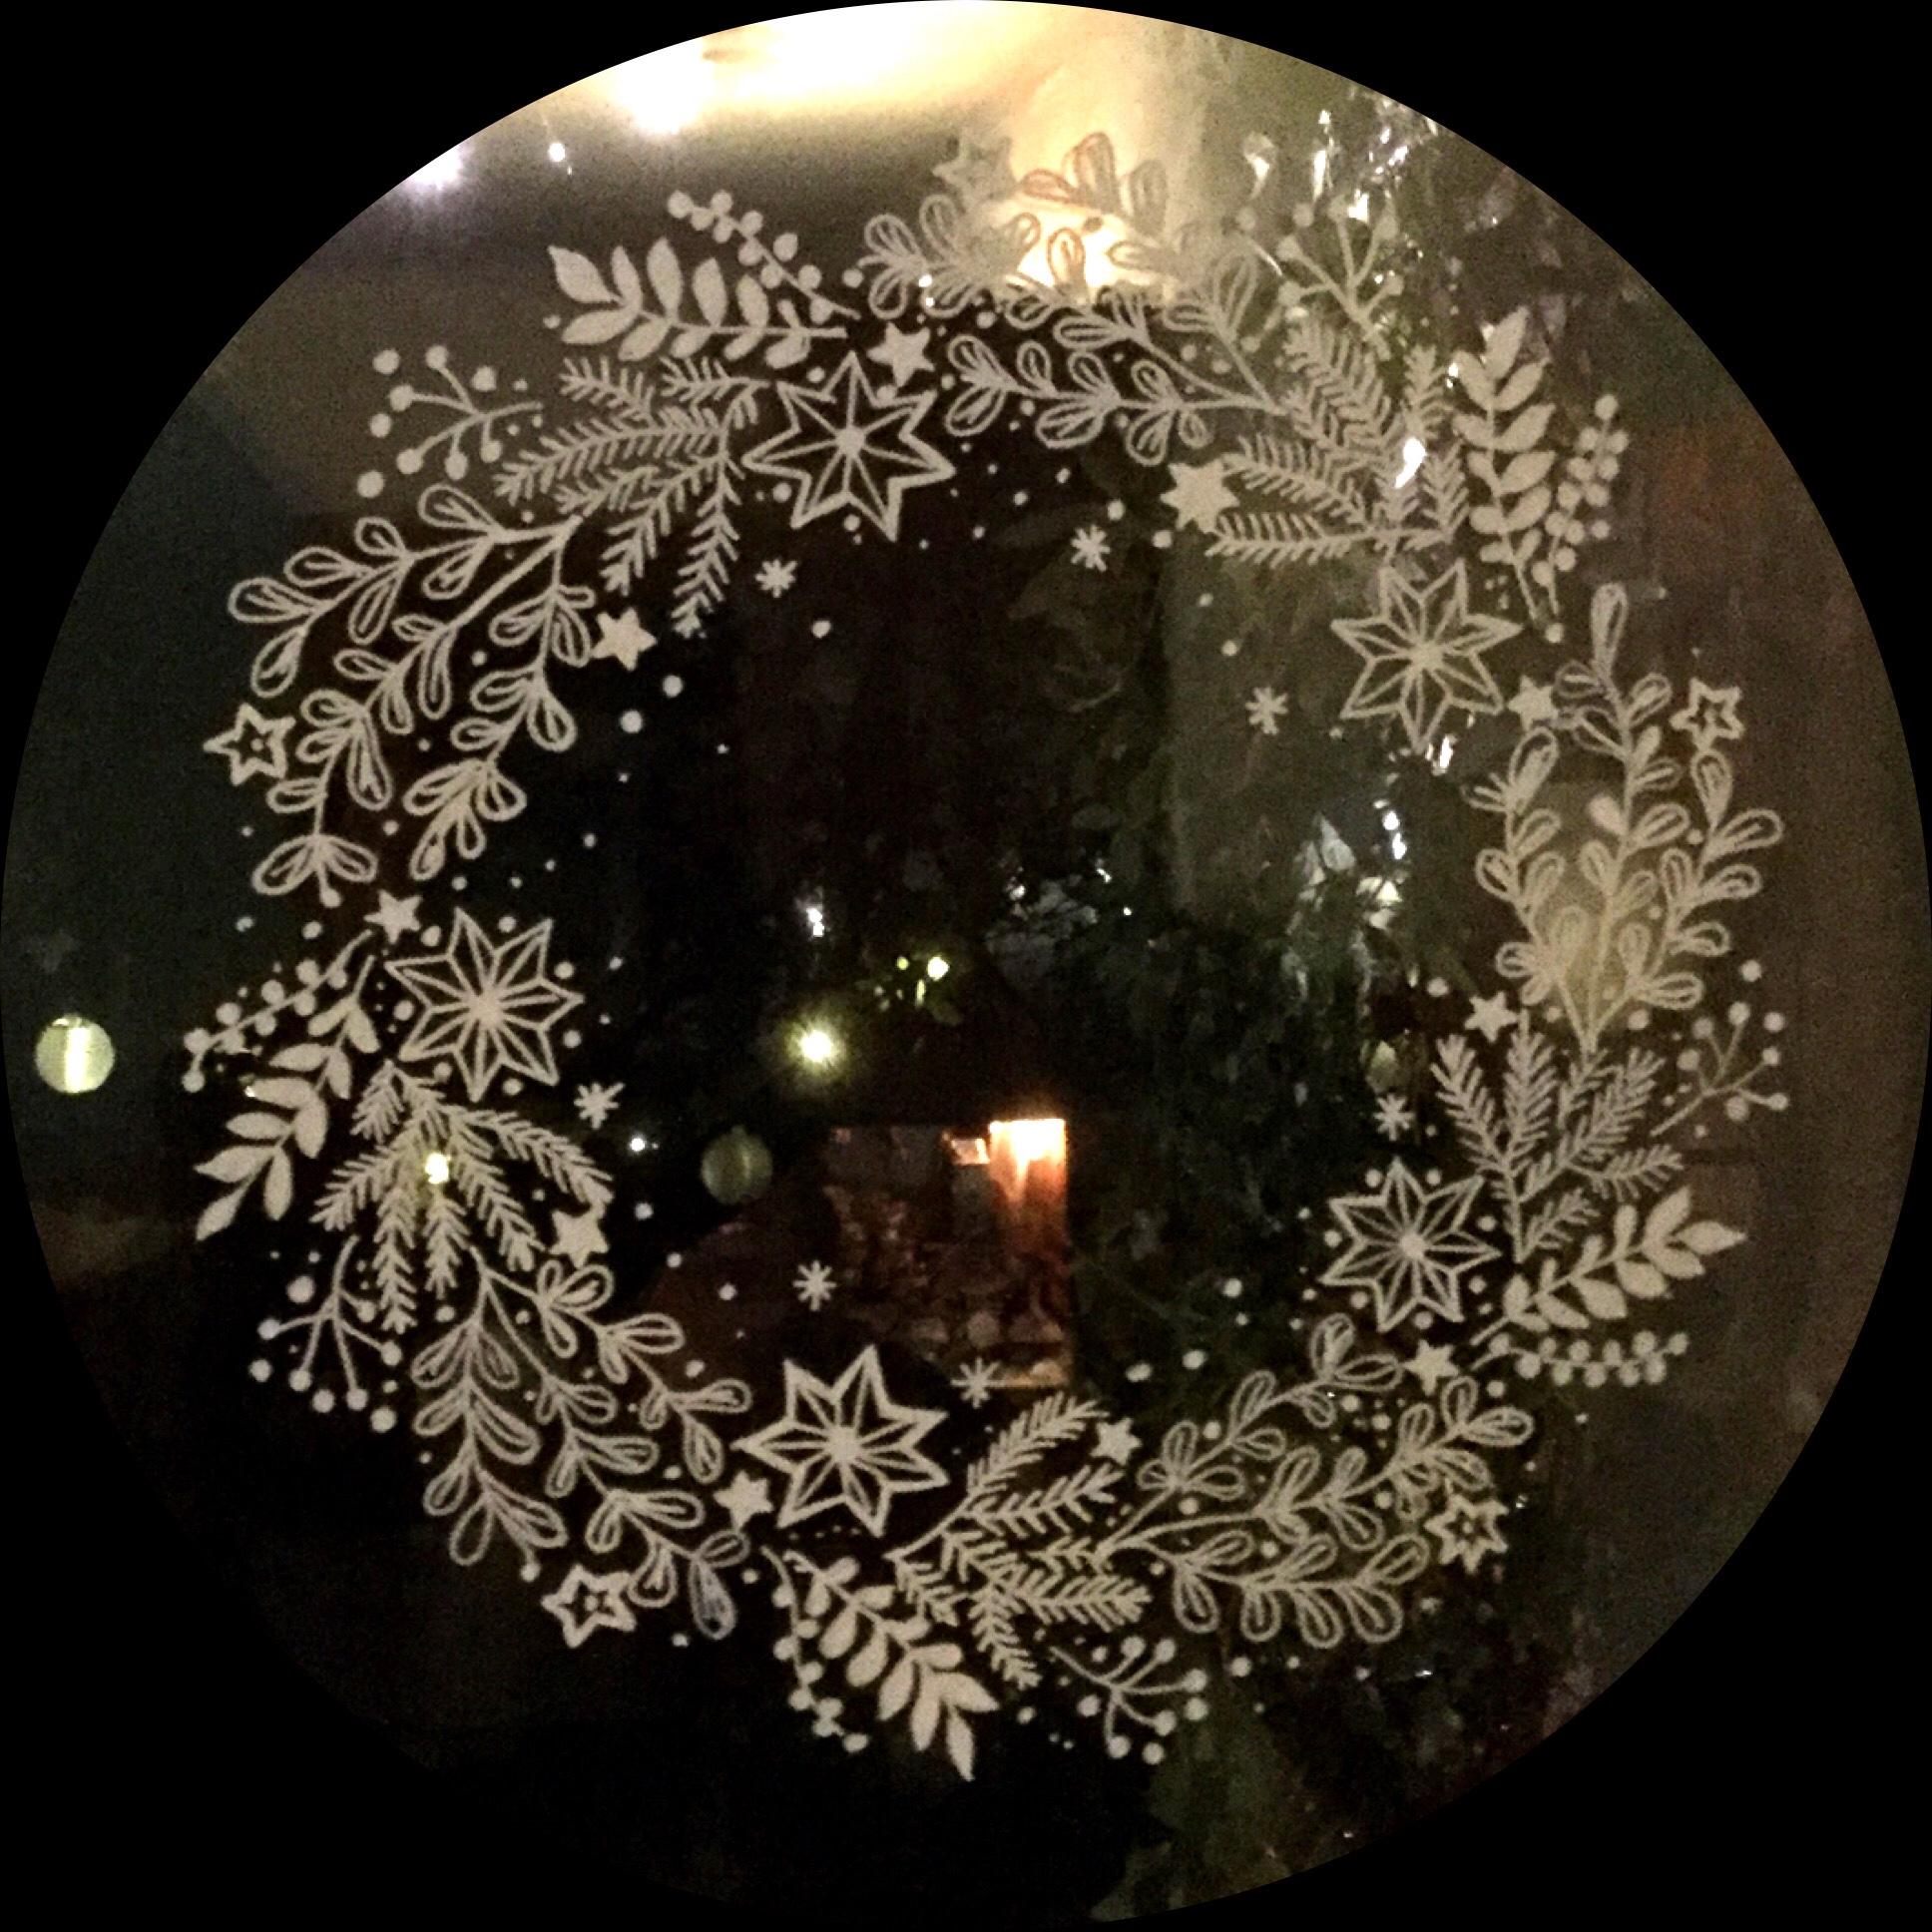 Weihnachtszeit bei Lilamalerie #4 – oder – Wo man singt, da lass dich nieder